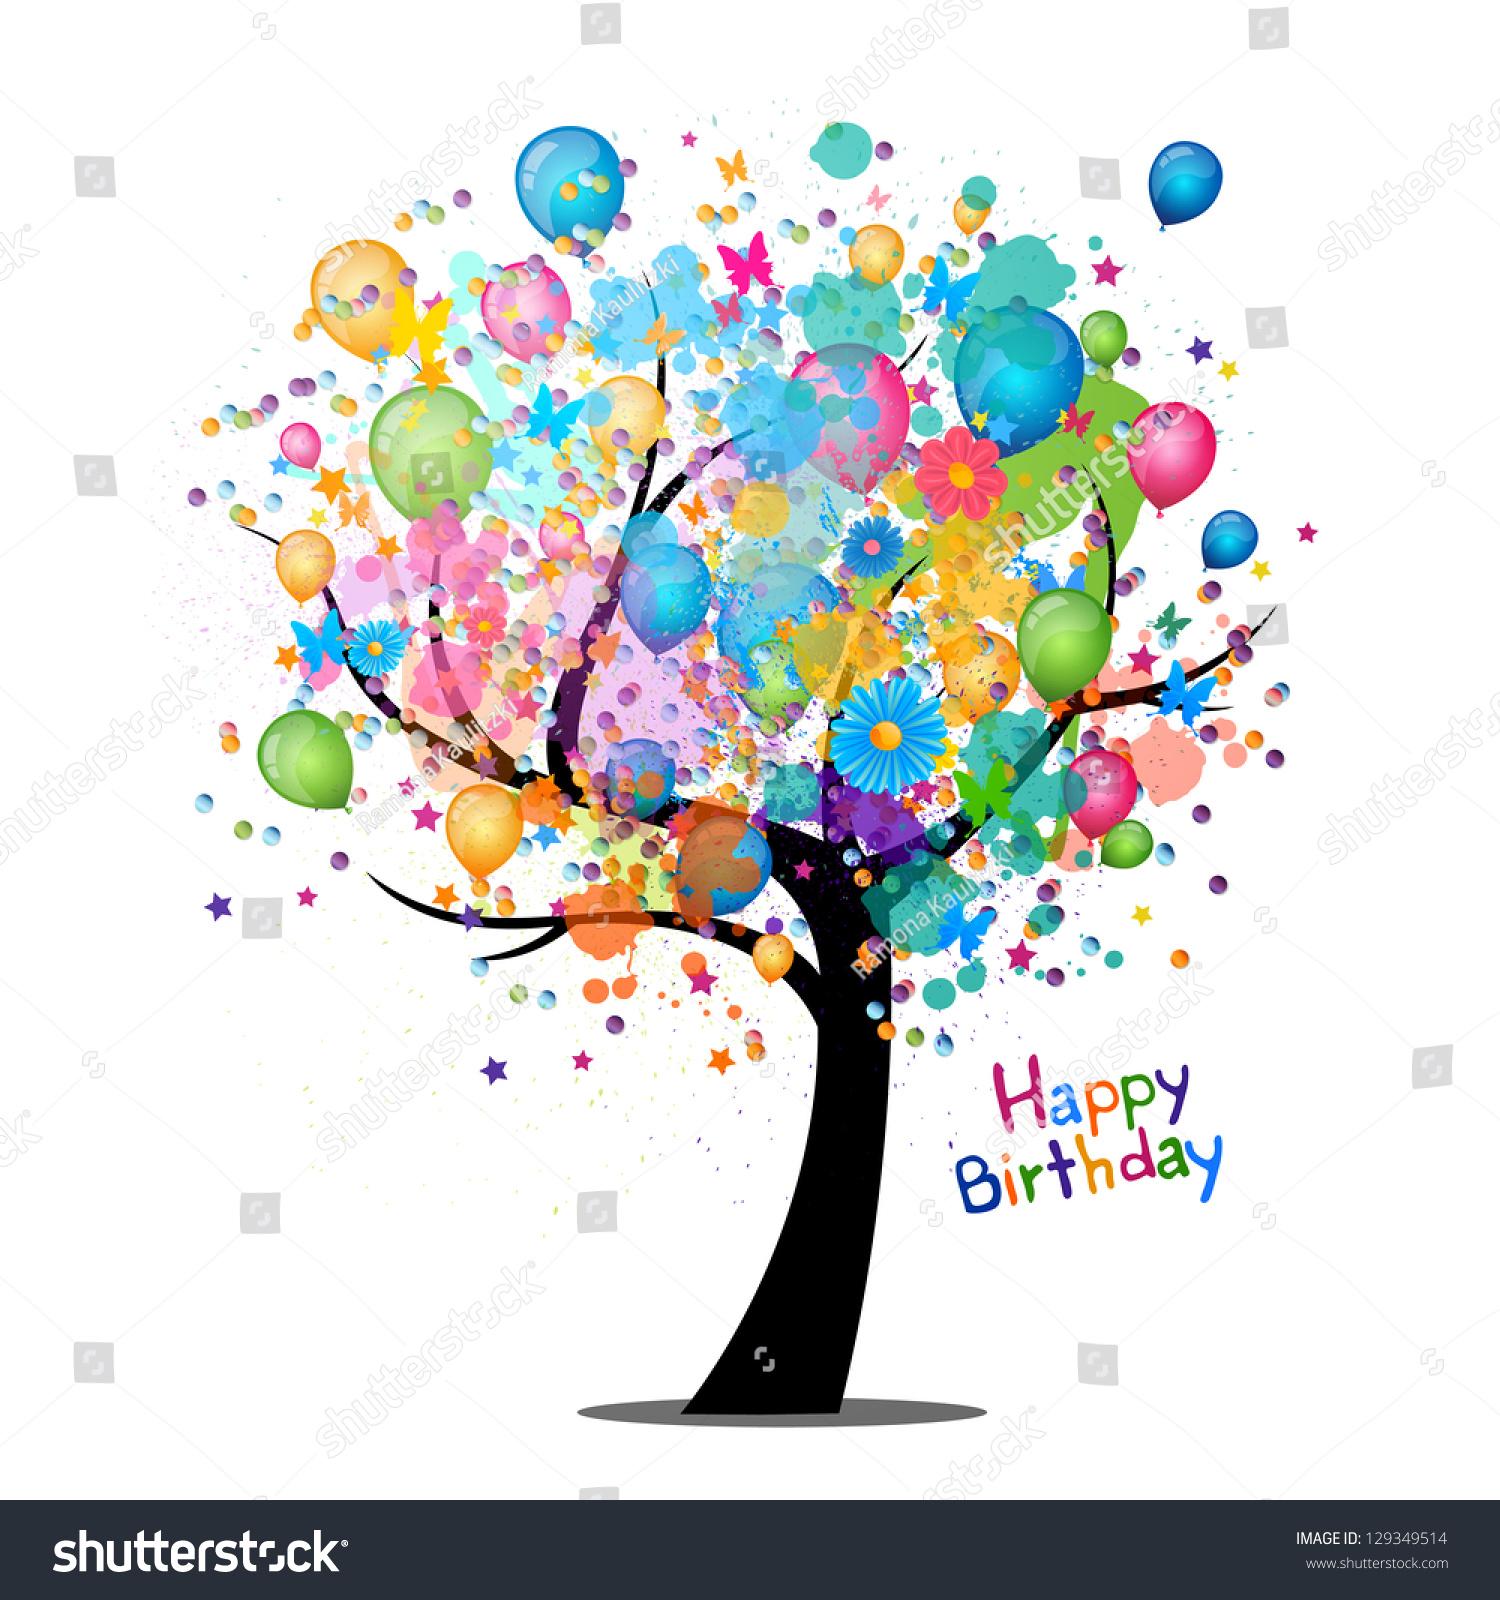 Royalty Free Vector Illustration Of A Happy Birthday 129349514